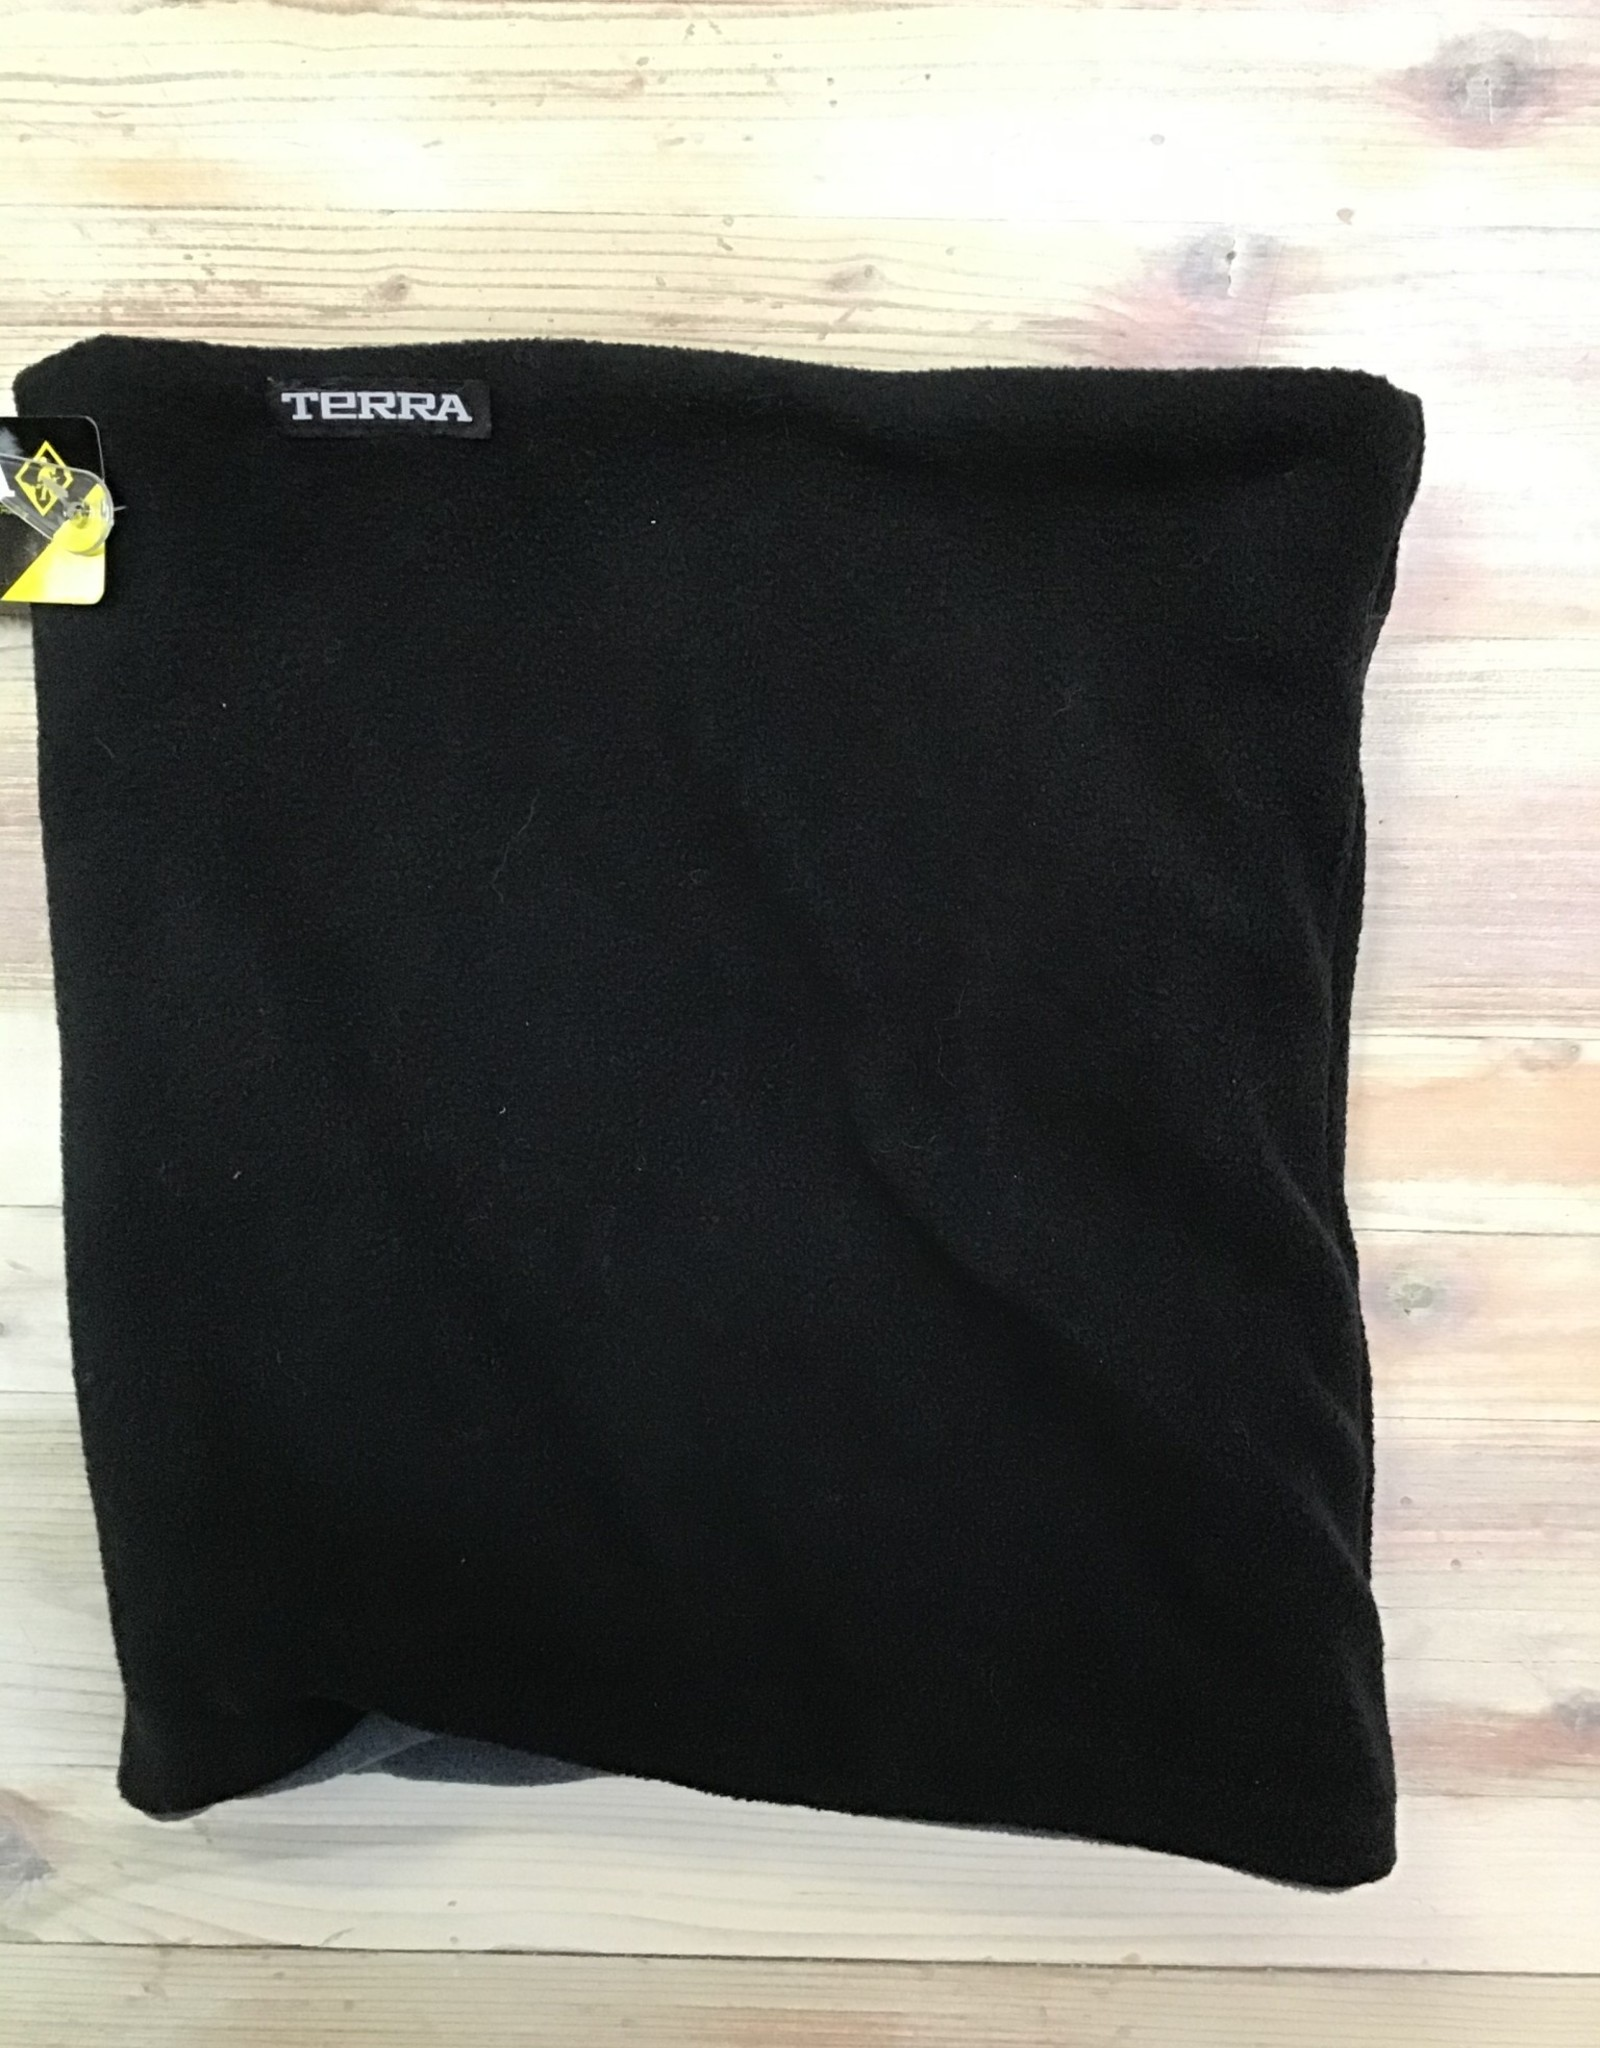 Terra Terra 1303001 Reversible Neck Warmer Unisex